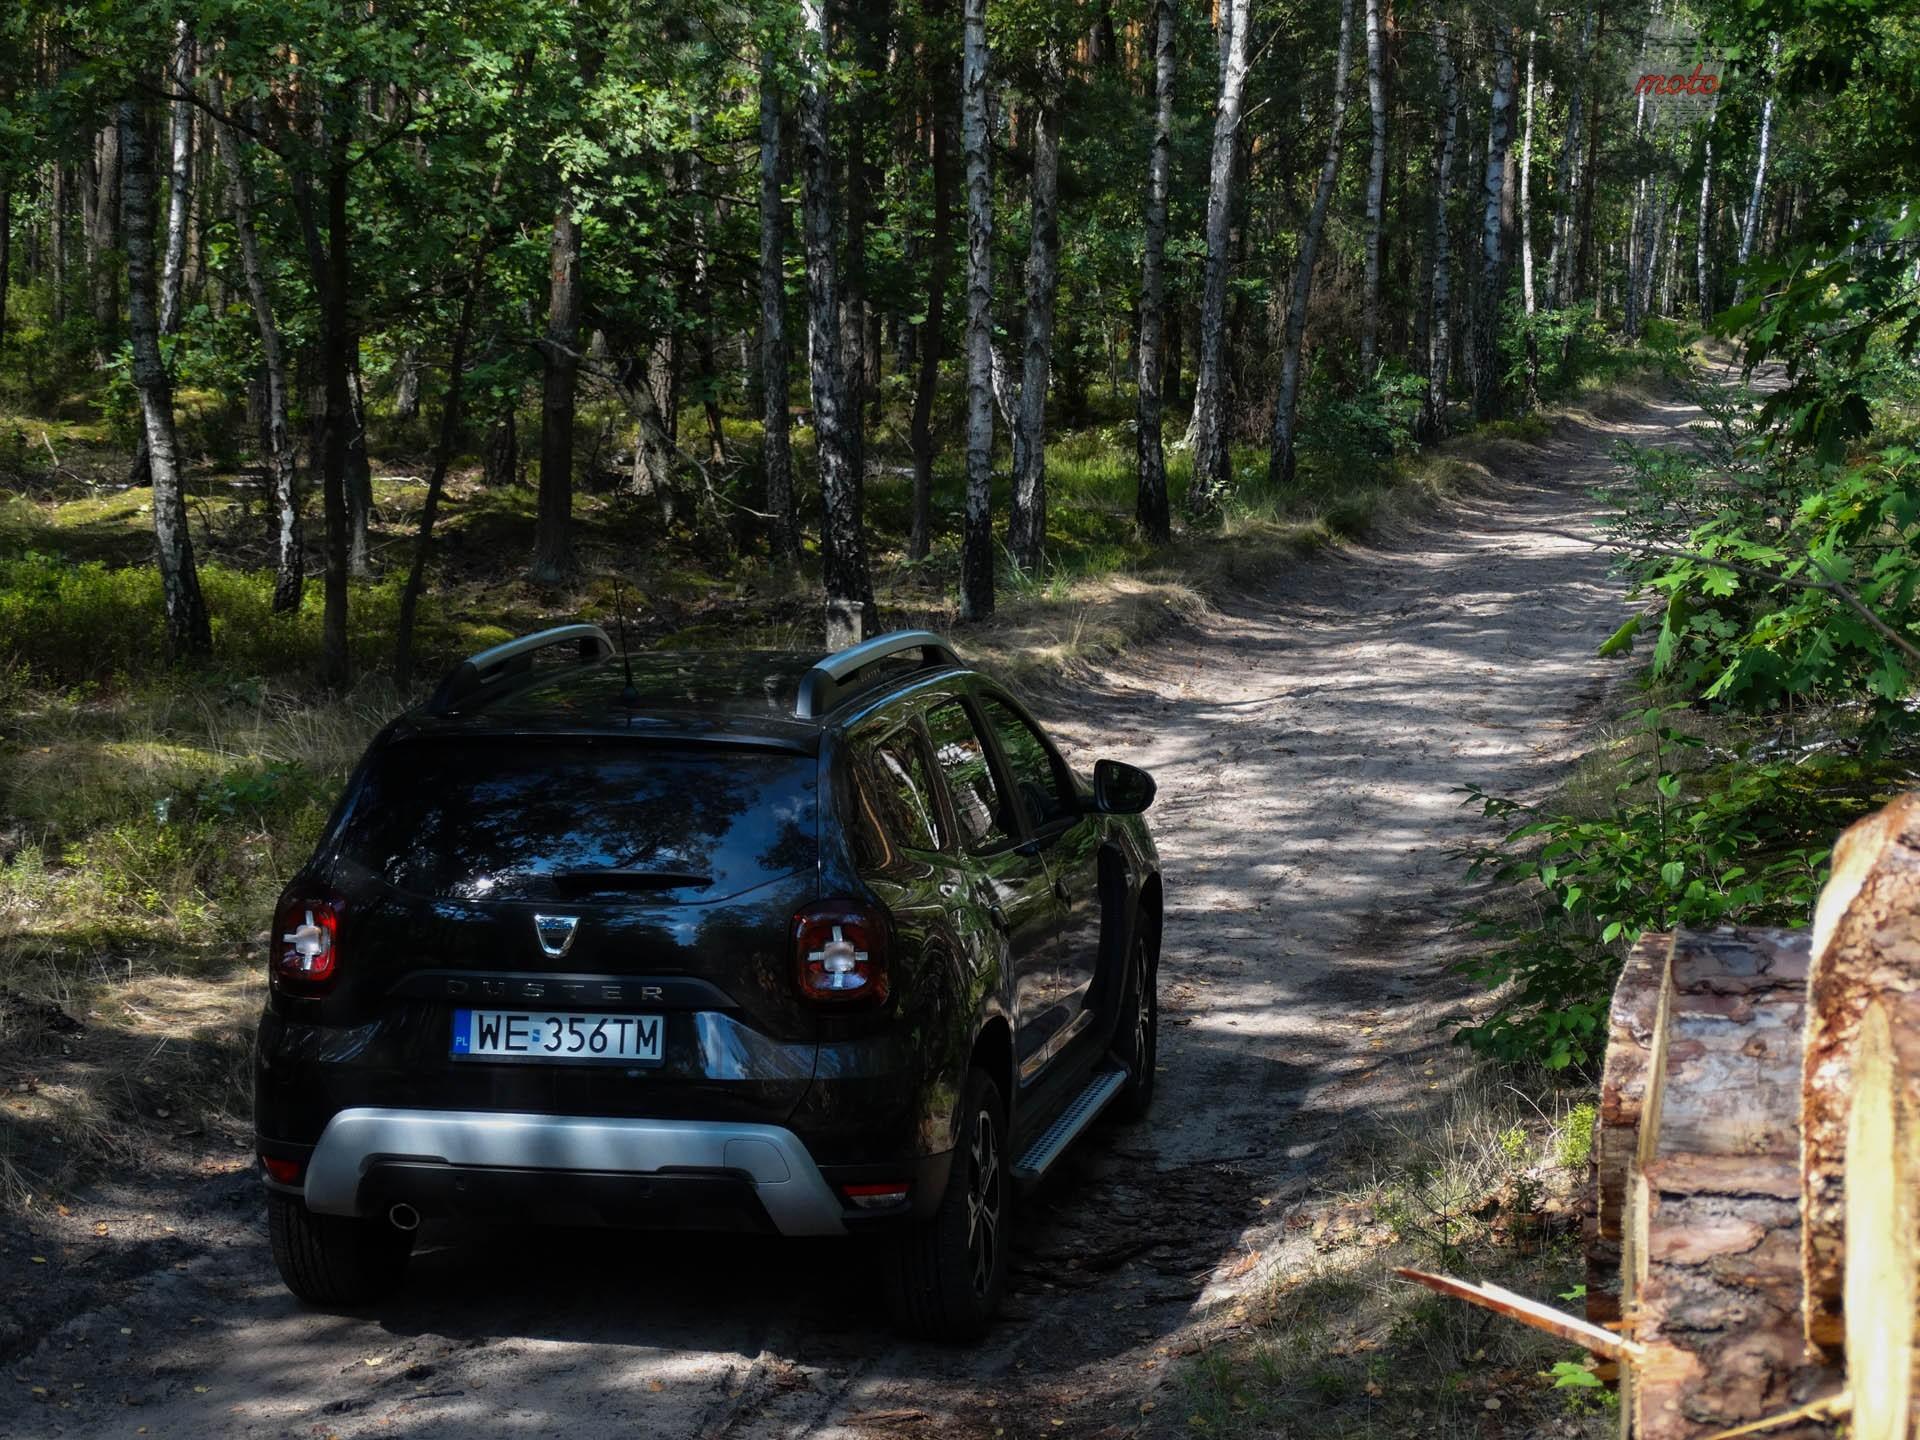 Dacia Duster 2 Test: Dacia Duster PRESTIGE 1.5 dci 4WD – w prostocie siła!